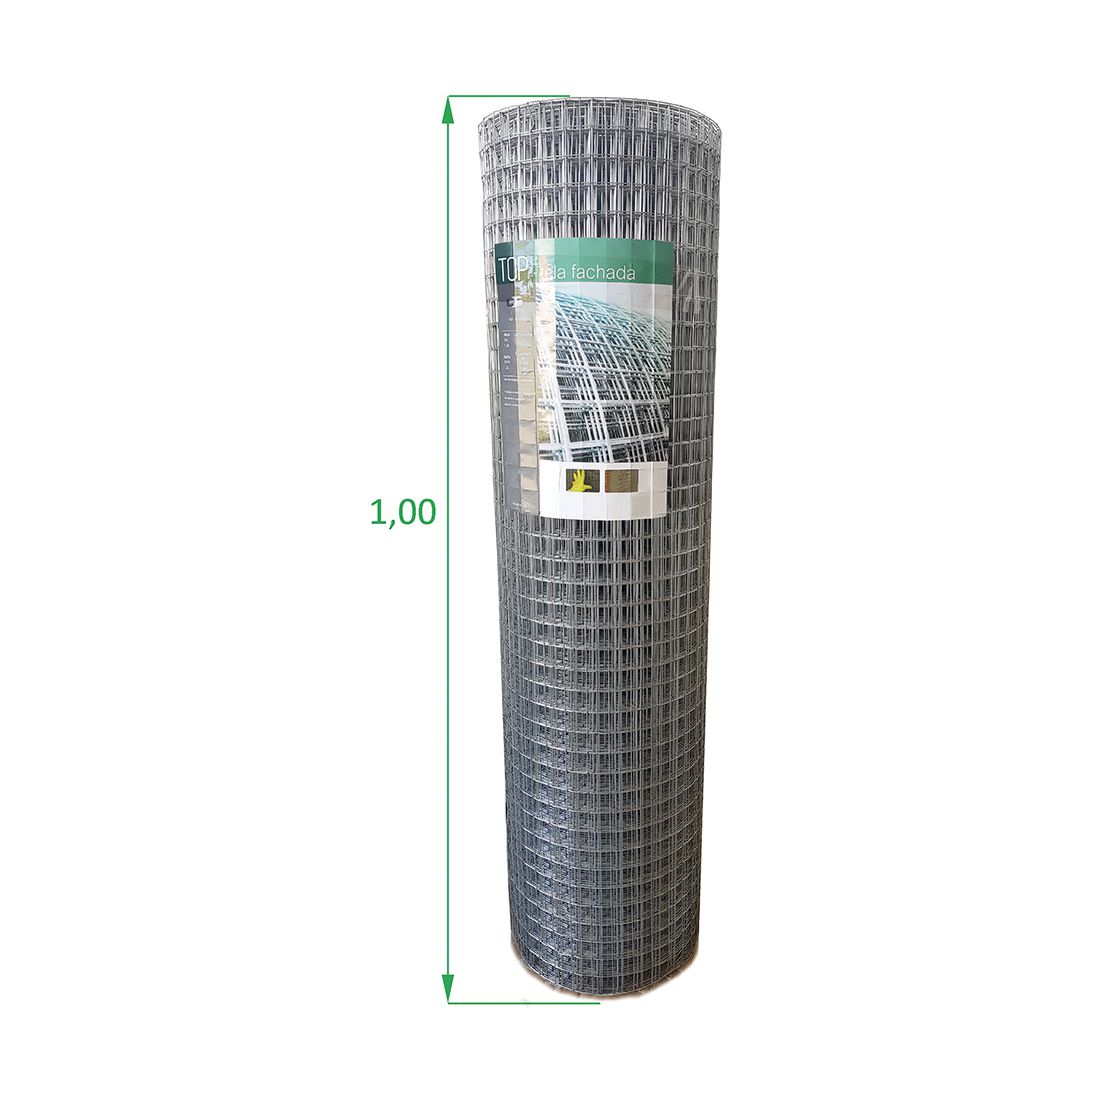 Tela Soldada - 1,00 x 25 m Fachada - Malha 2,5 x 2,5 cm